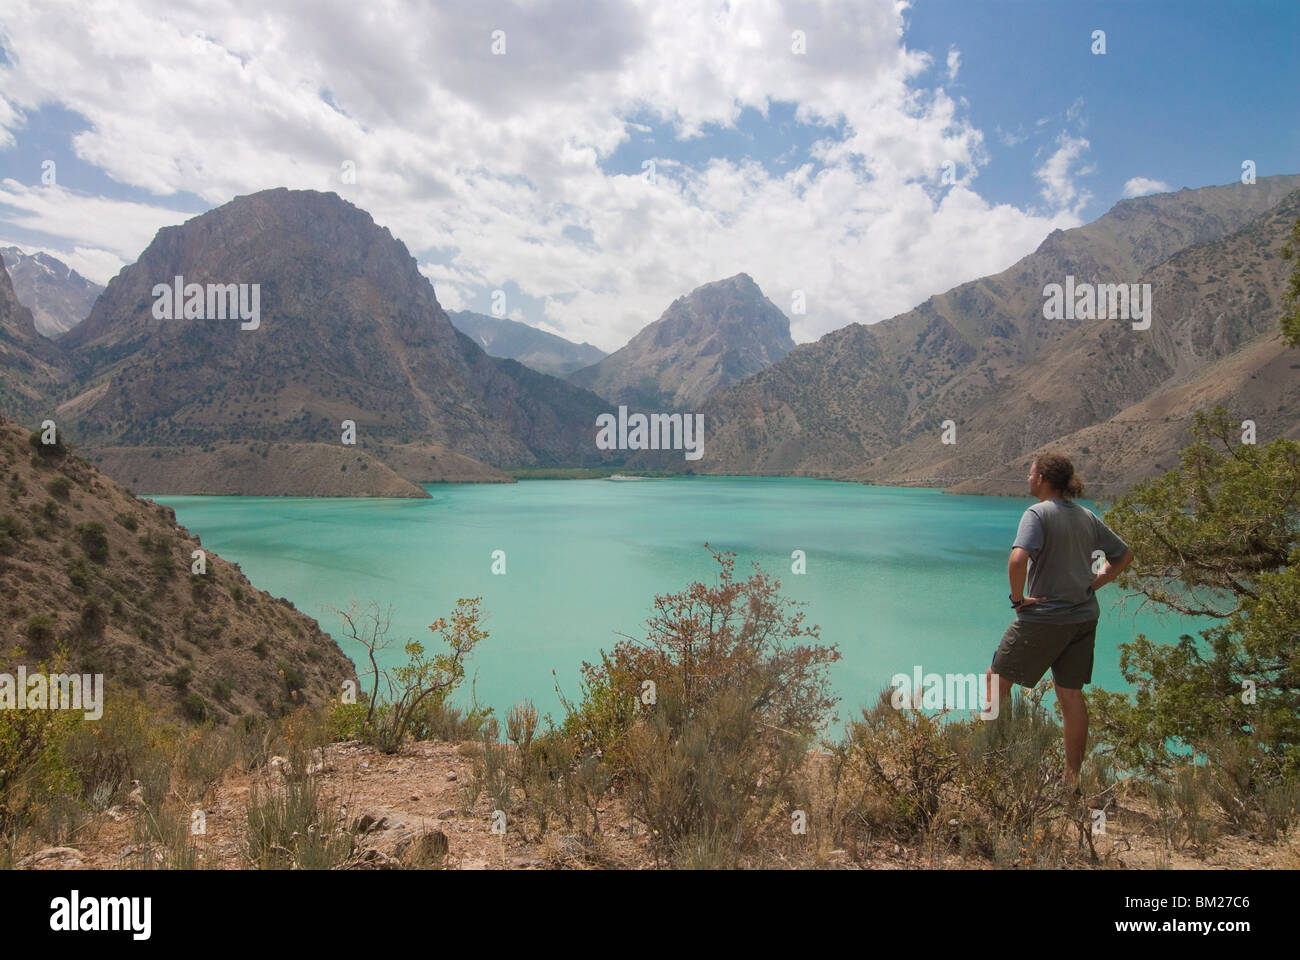 Türkis Iskanderkul See (Alexander) in Fann Gebirge, Iskanderkul, Tadschikistan, Zentralasien Stockbild